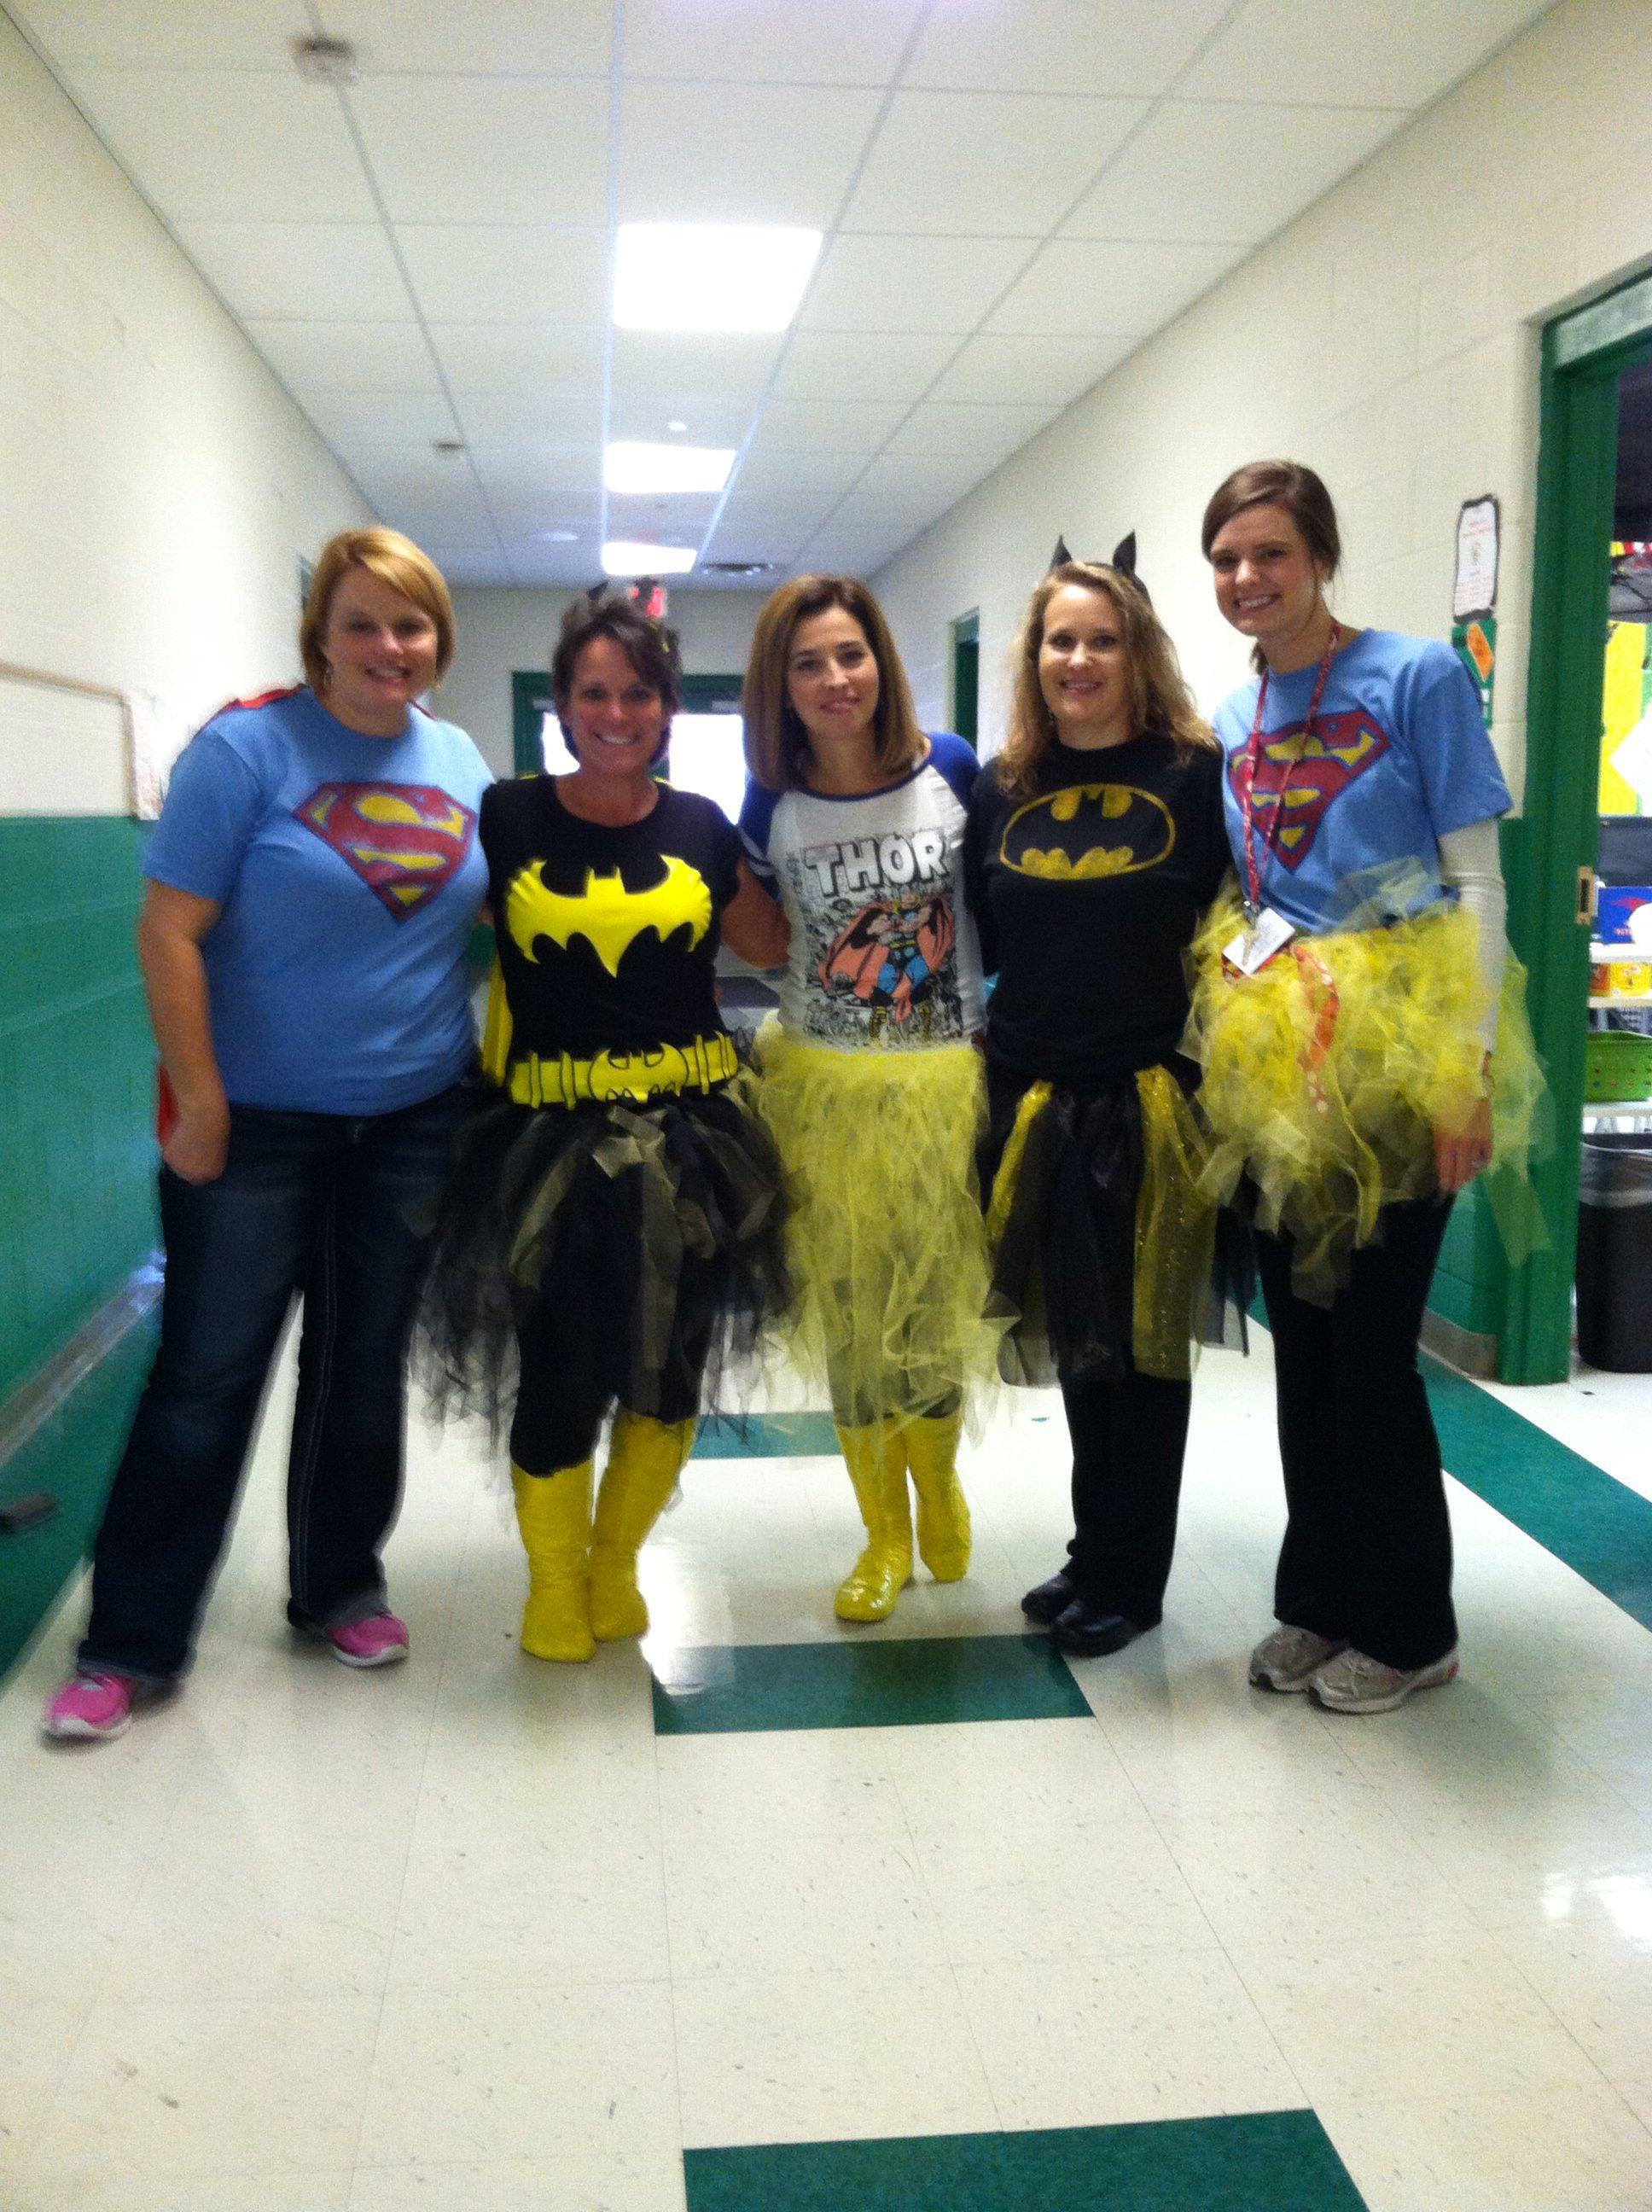 Teachers Make Natural Super Heros Super Hero Day Halloween School Dress Up Day